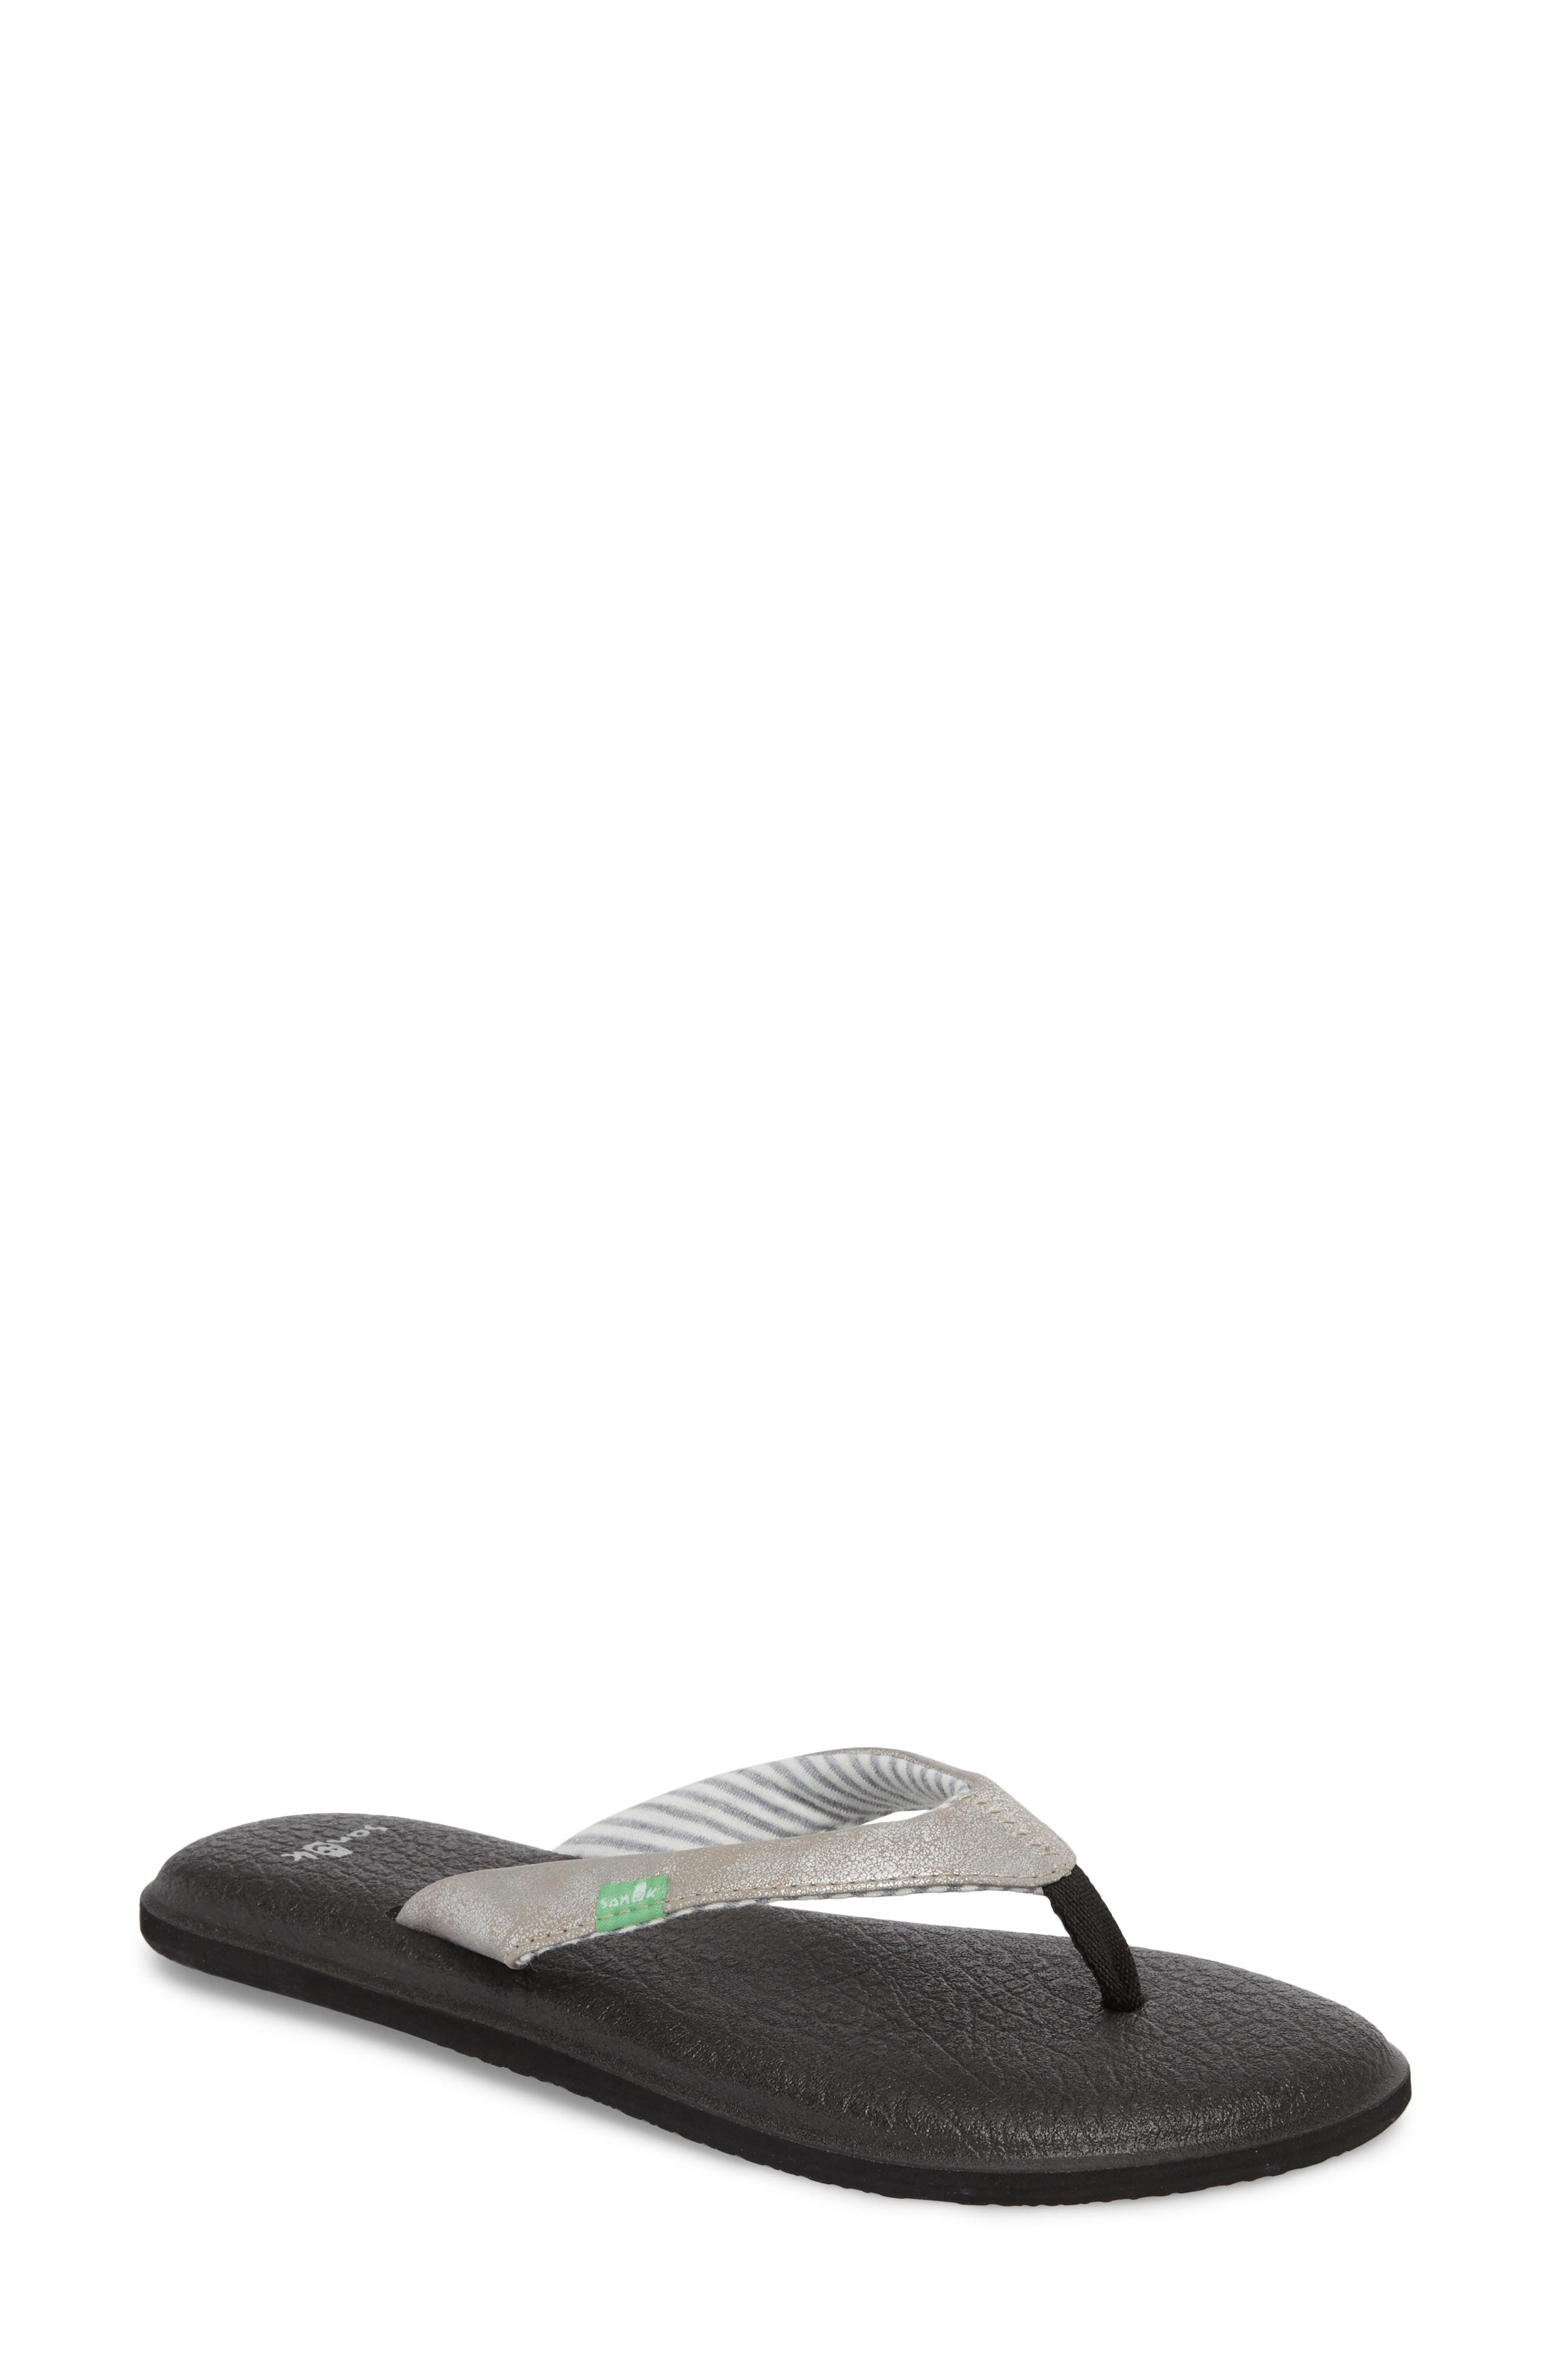 sanuk check burberry leather shoes flops pin meadow yoga all flop house mats mat flip nocolor